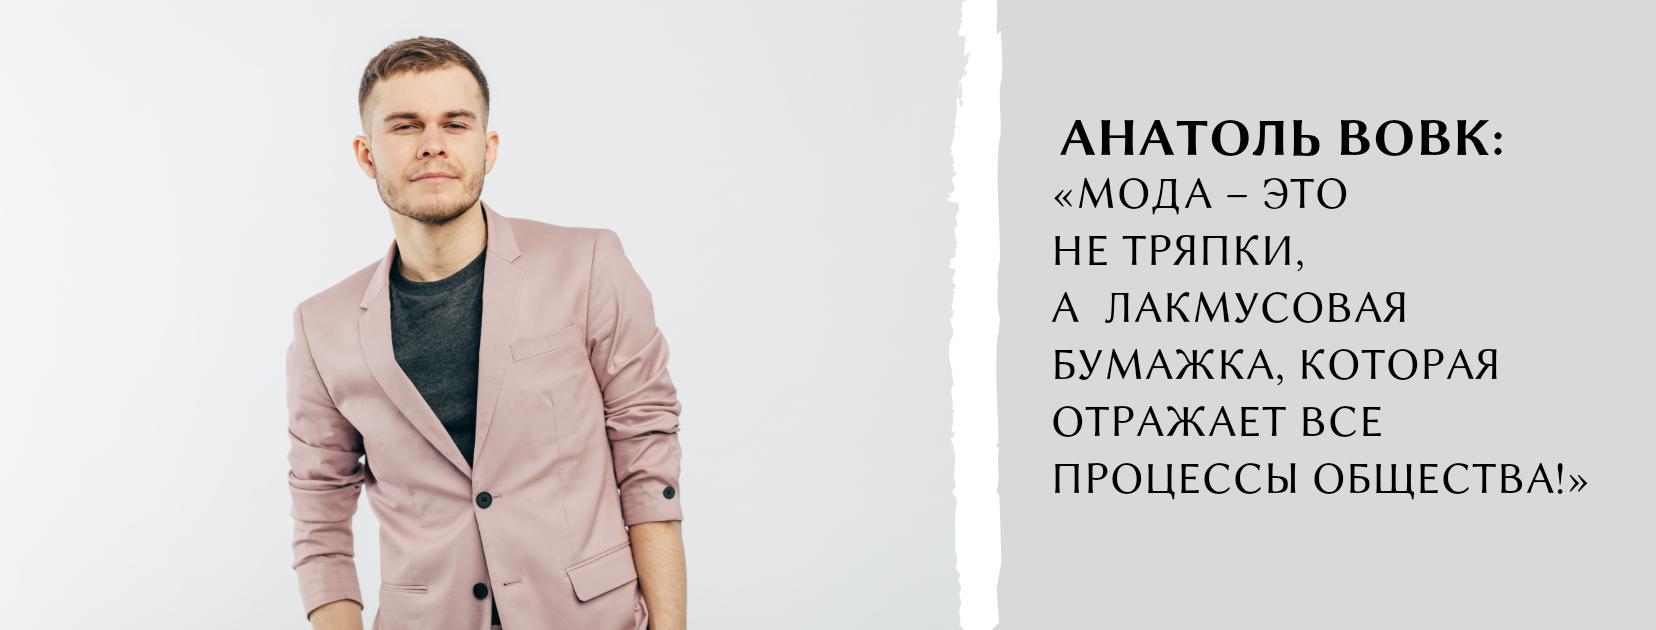 Мода - это не тряпки! в ТК ЭКОПОЛИС premium